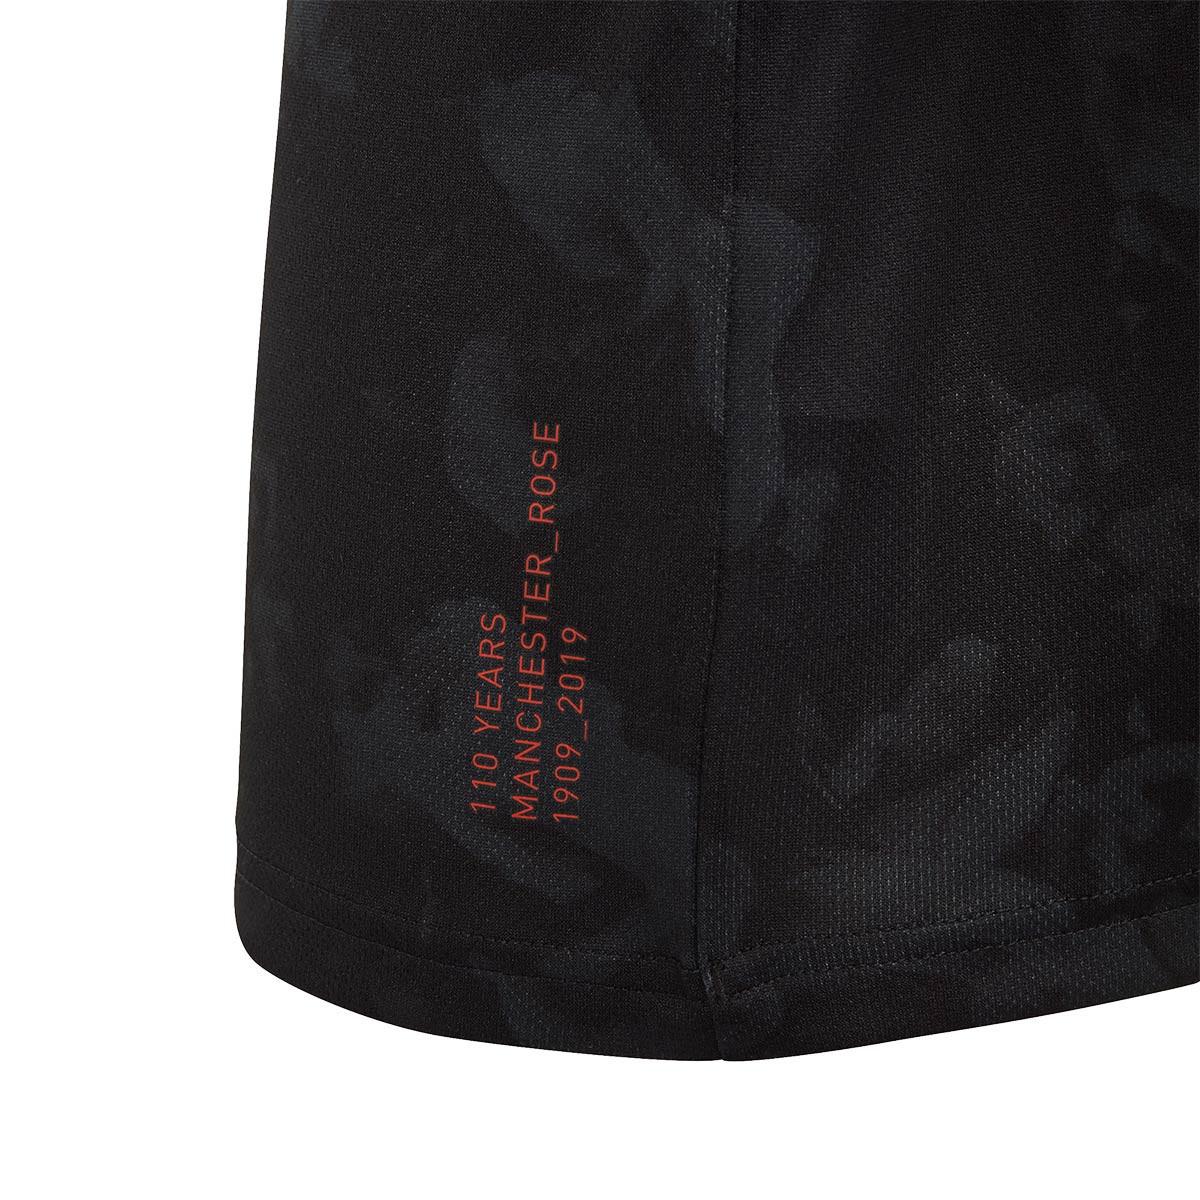 Jersey Adidas Manchester United Fc 2019 2020 Third Black Football Store Futbol Emotion